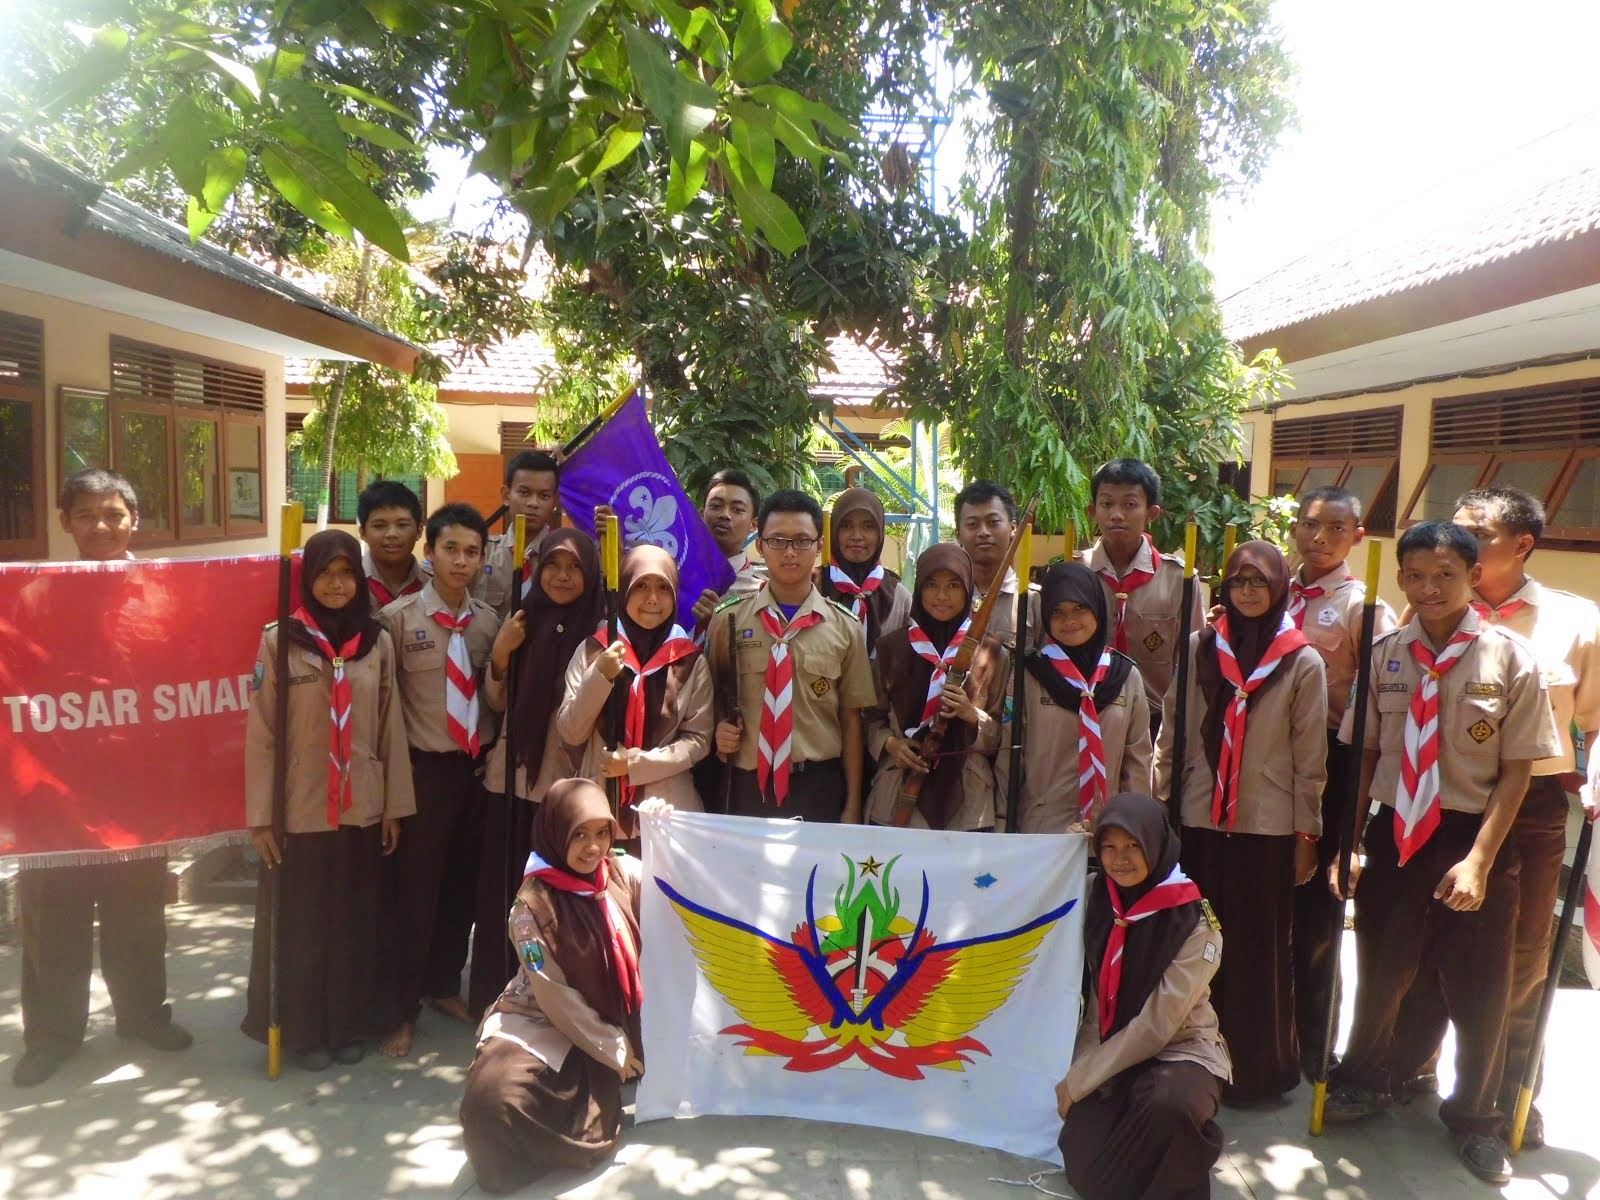 My Family Ambalan Kretarto Dewi Sartika